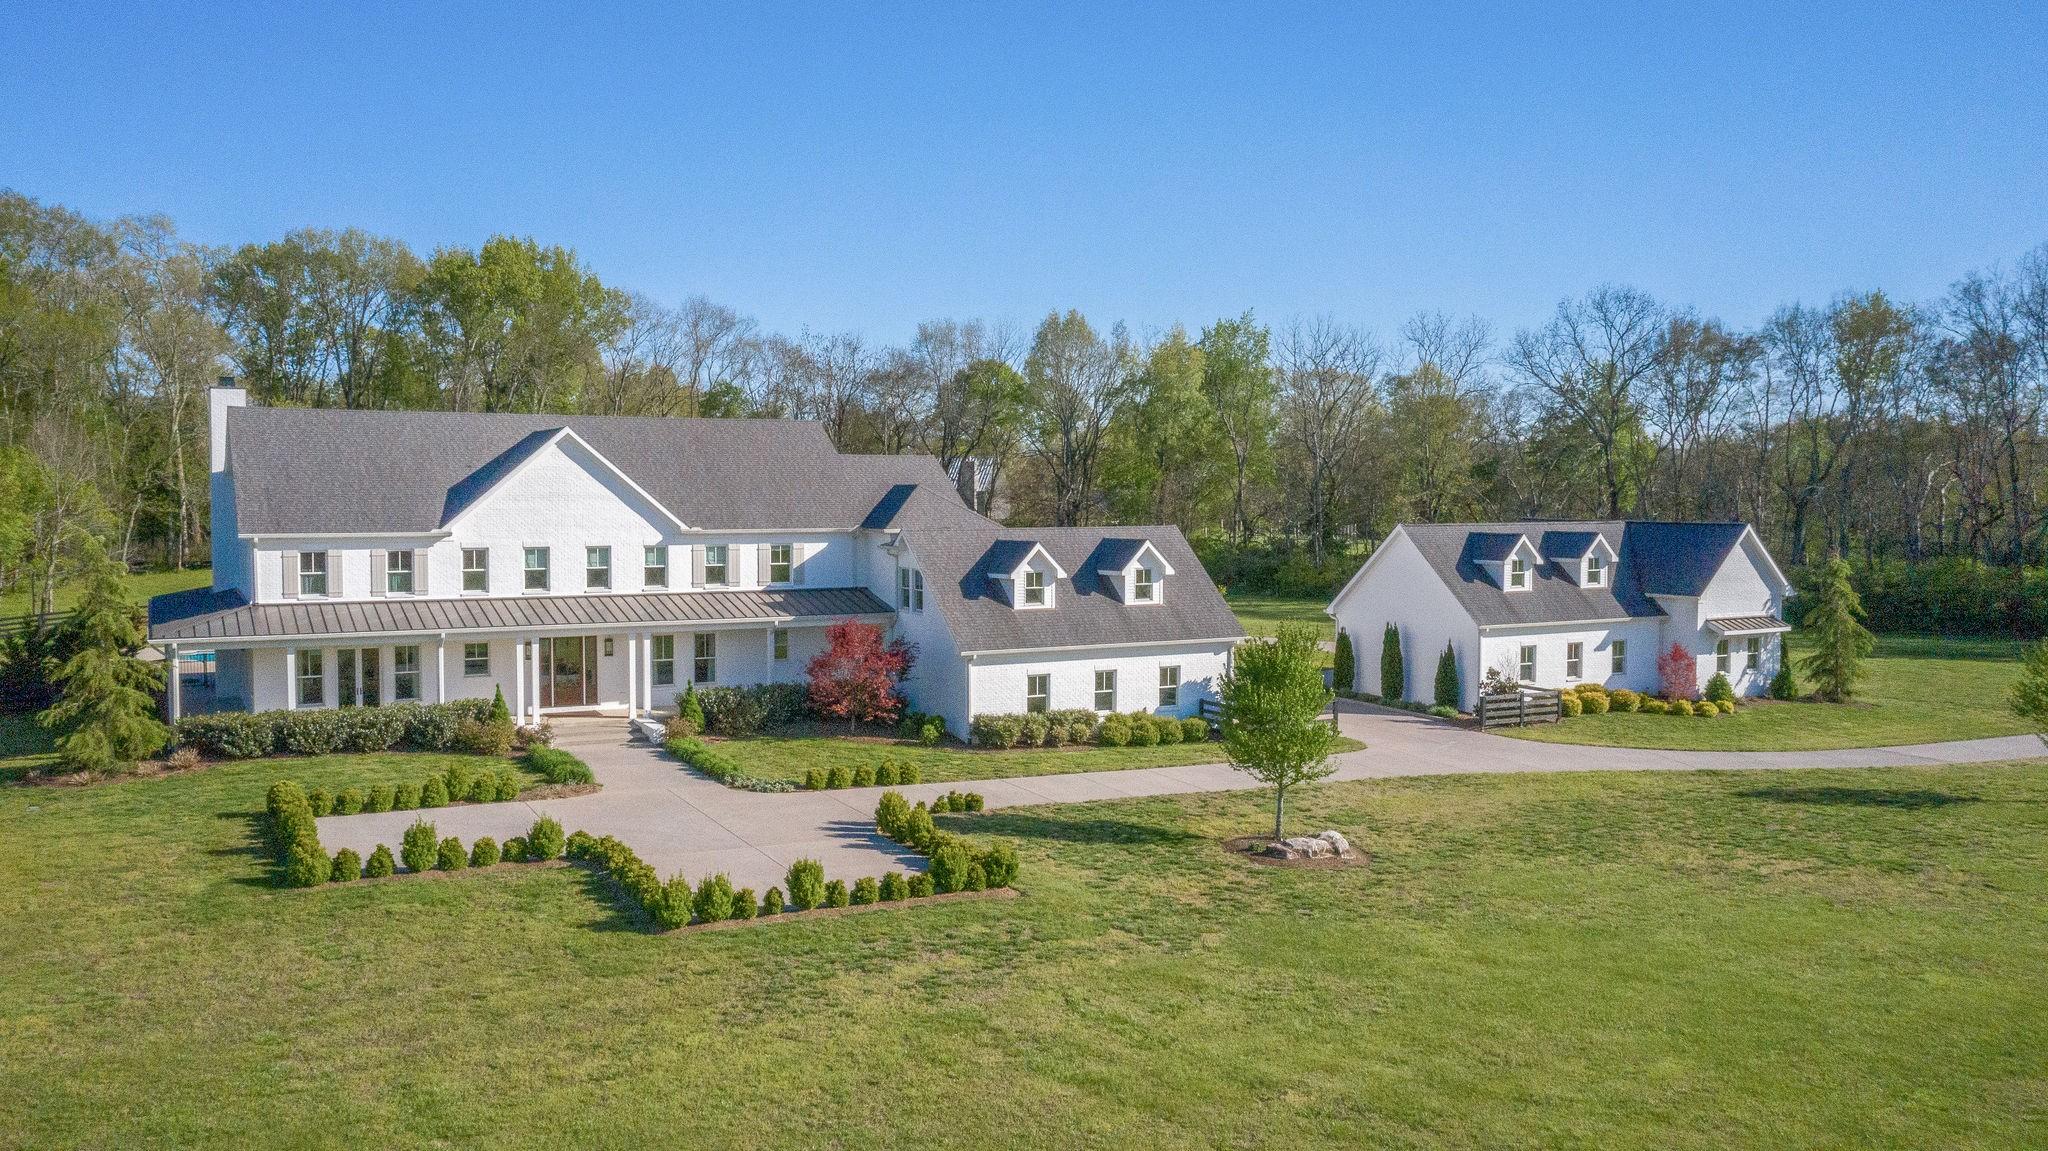 4224 Two Rivers Lane, Franklin, TN 37069 - Franklin, TN real estate listing